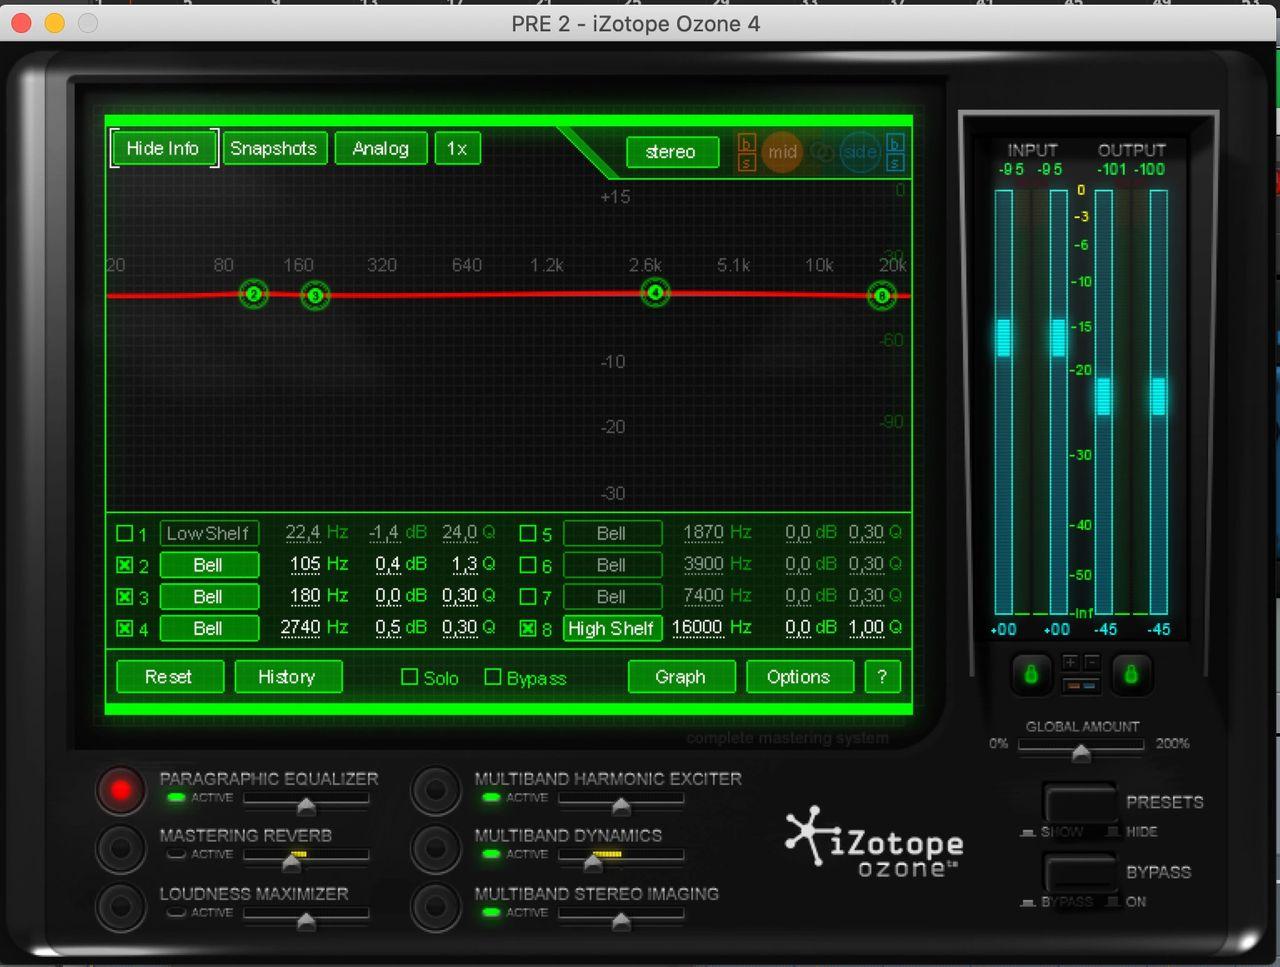 Jaycen Joshua Mix Bus Chain | Jaycen Joshua iZotope Ozone 4 Presets | Mixing and Mastering Chain